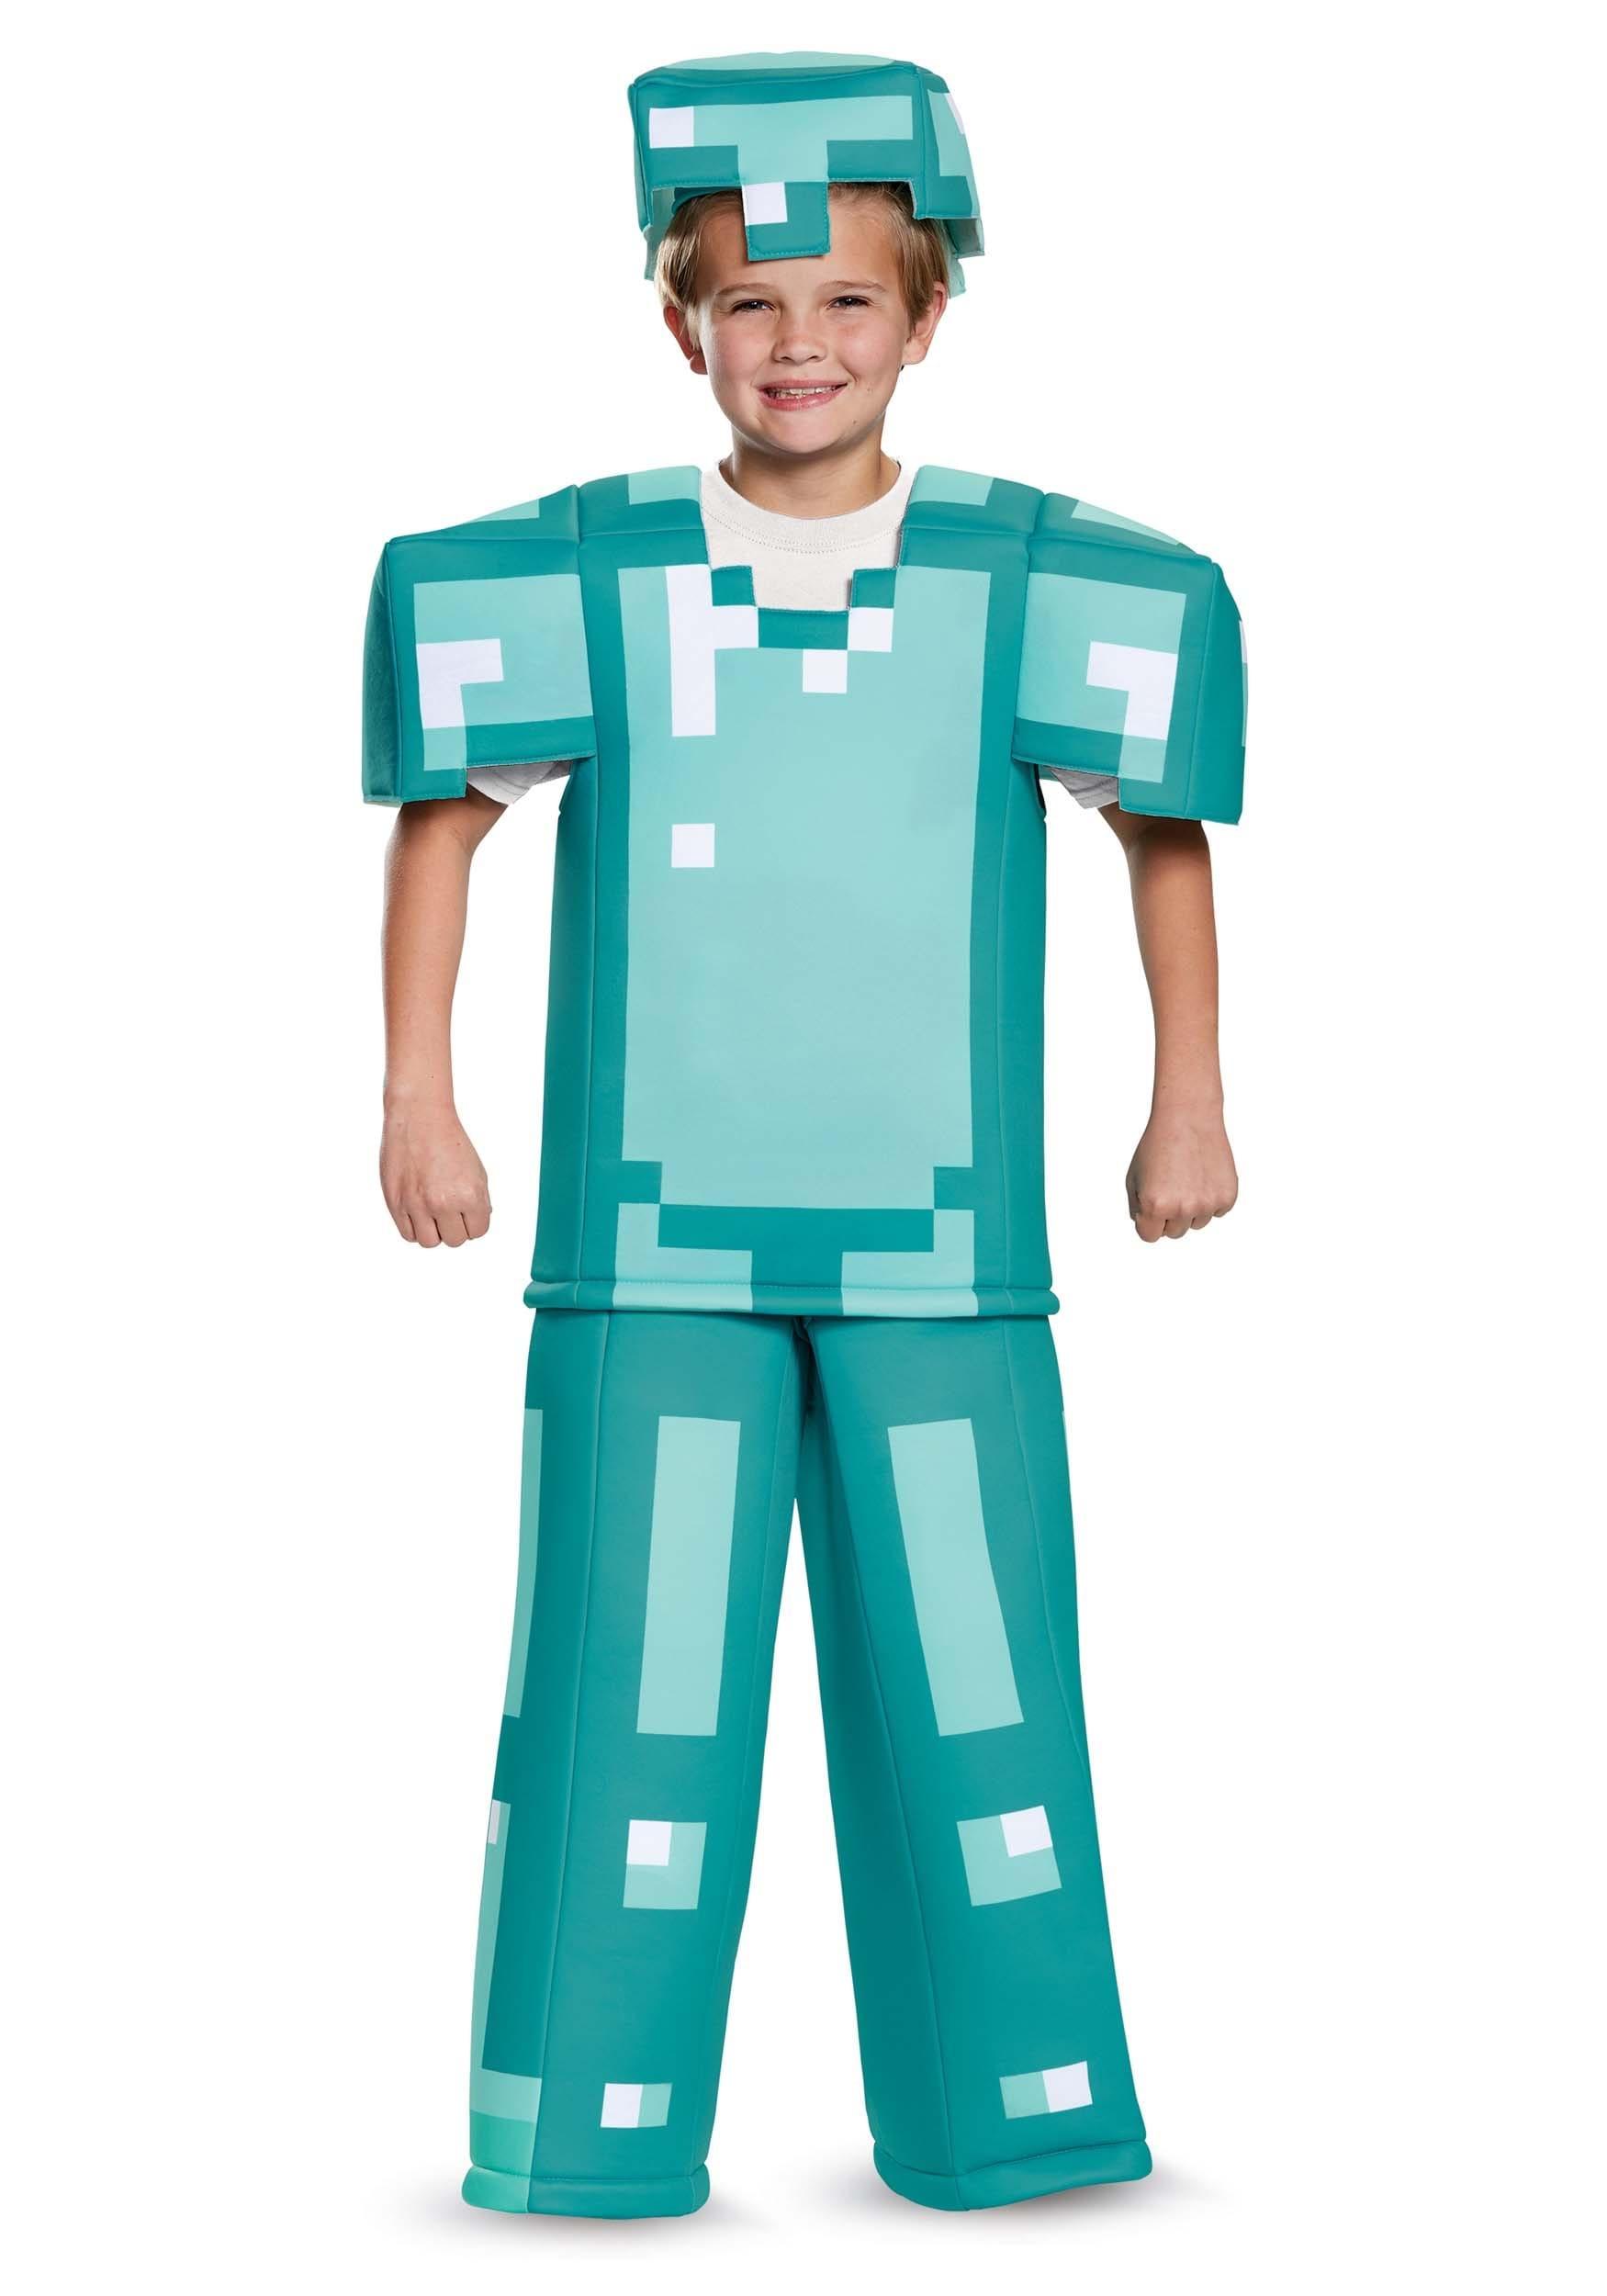 Prestige Minecraft Armor Costume for Kids d7e60b256dce4